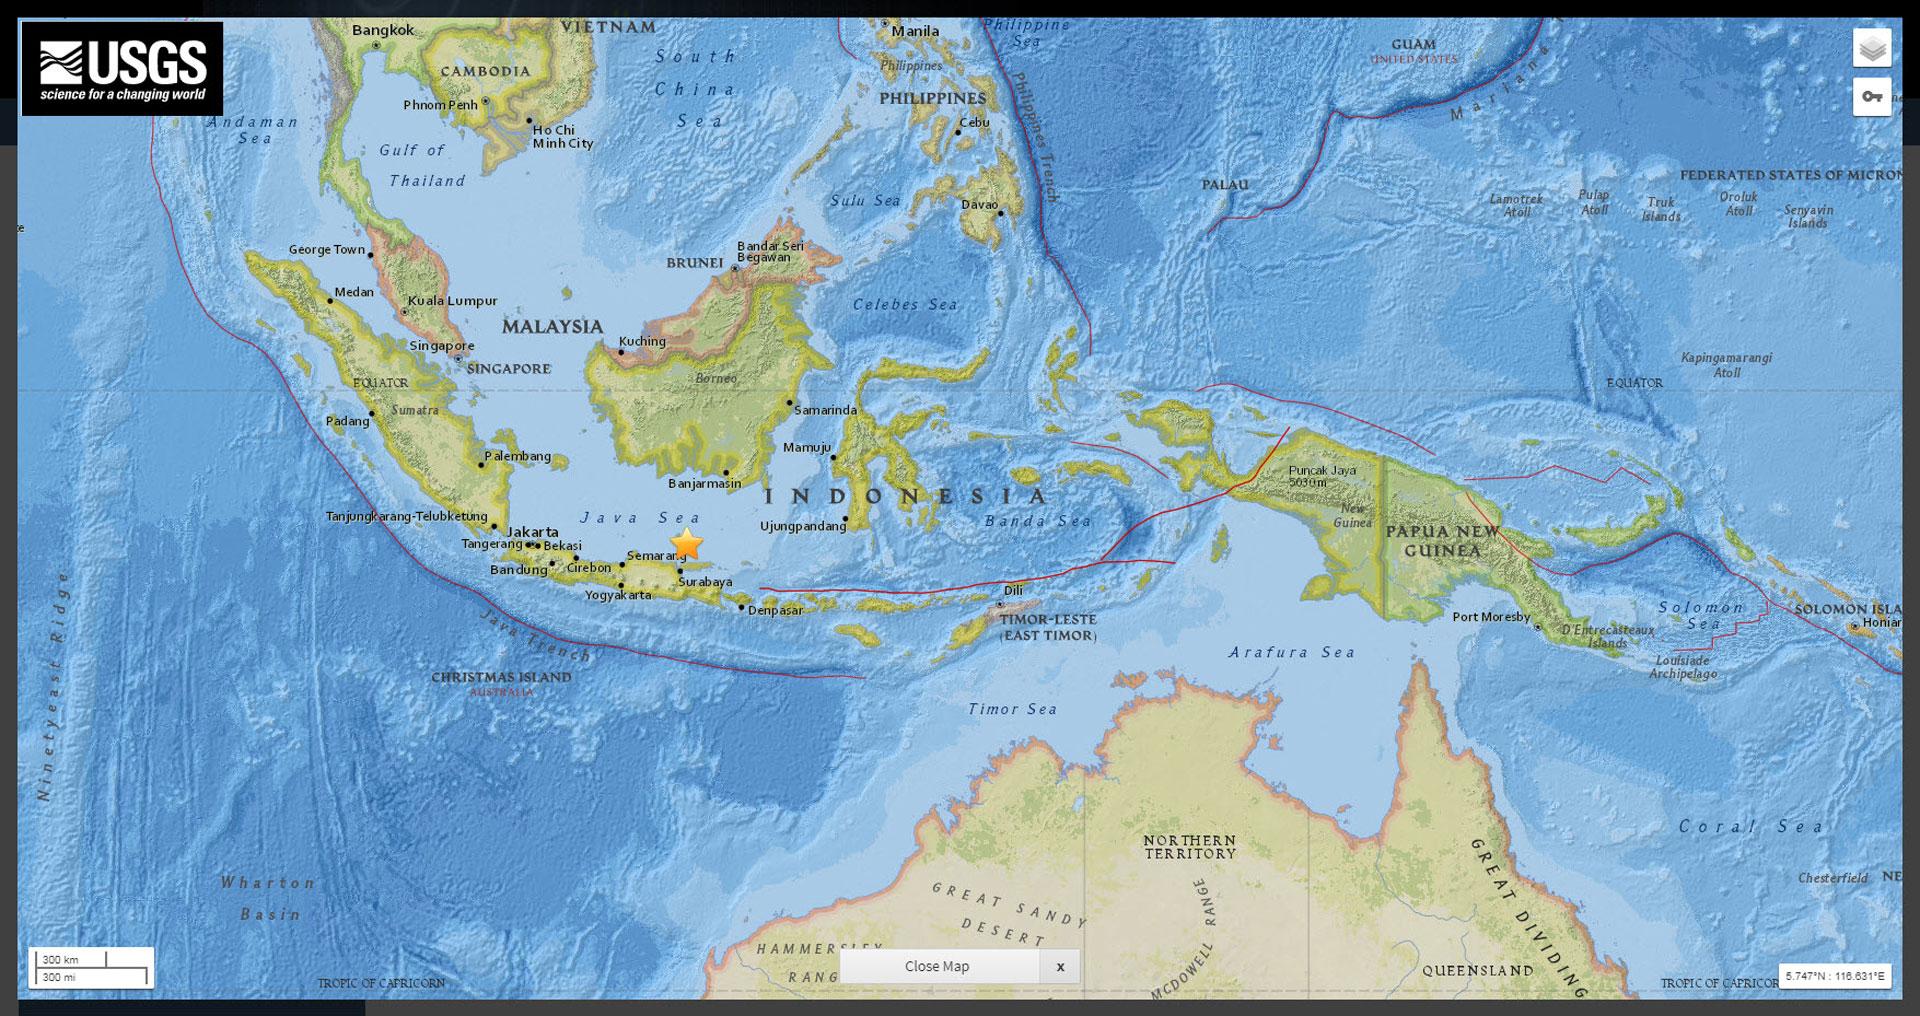 Magnitude 5.7 earthquake hits Indonesia